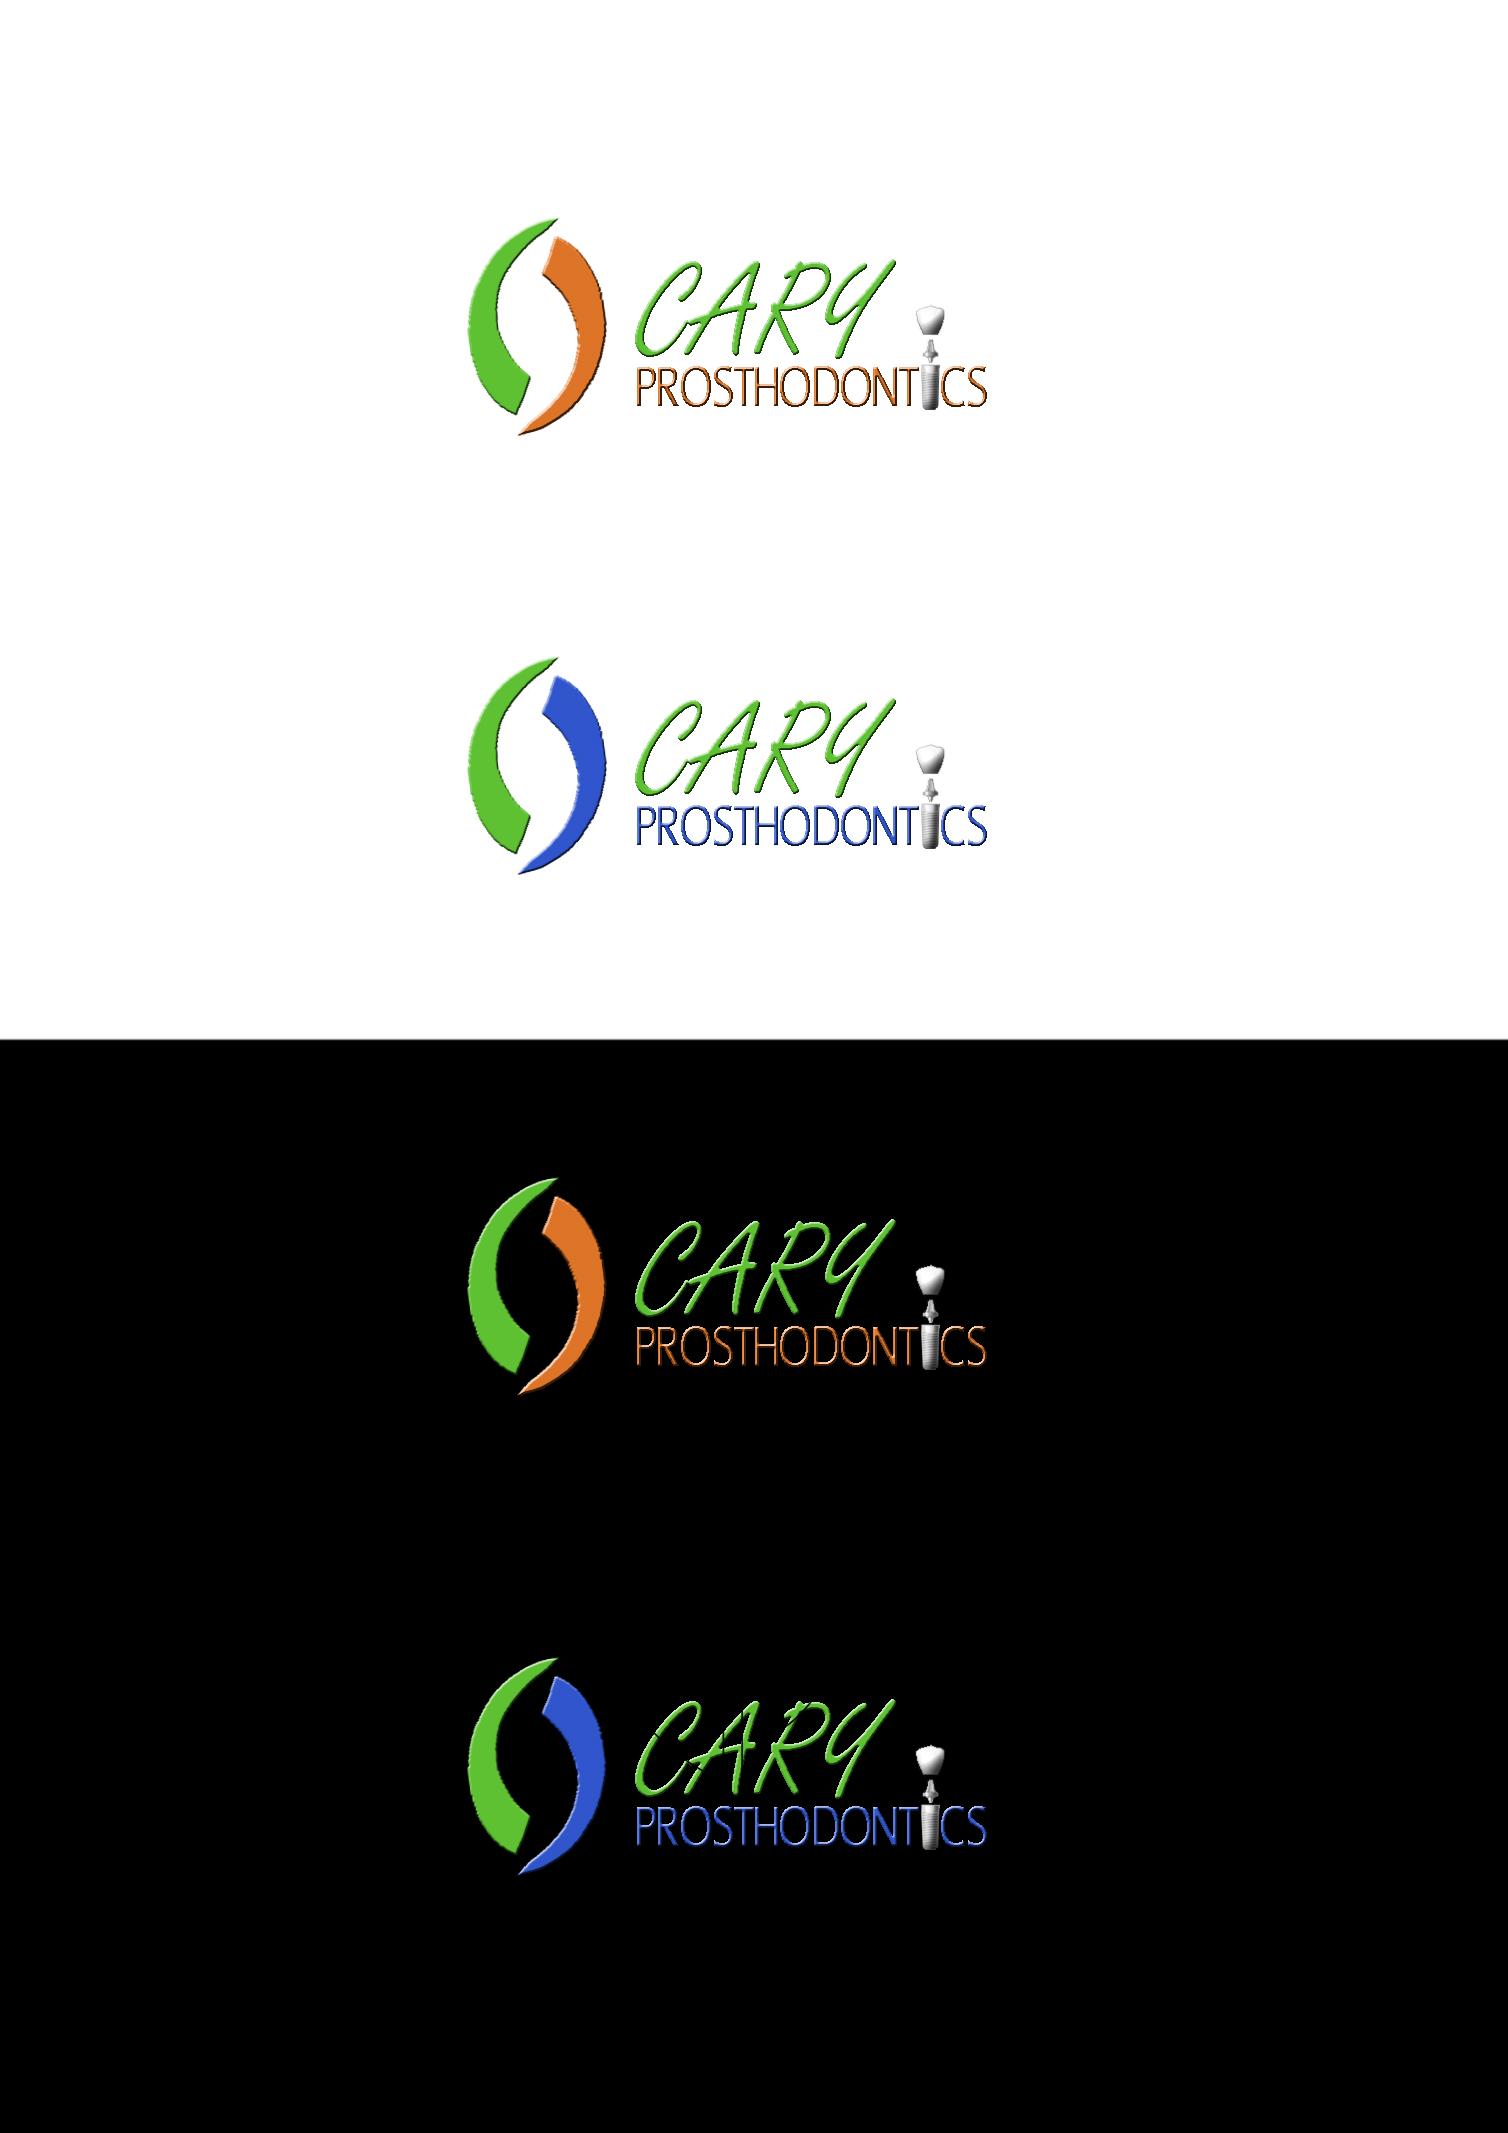 Logo Design by JSDESIGNGROUP - Entry No. 153 in the Logo Design Contest Cary Prosthodontics Logo Design.